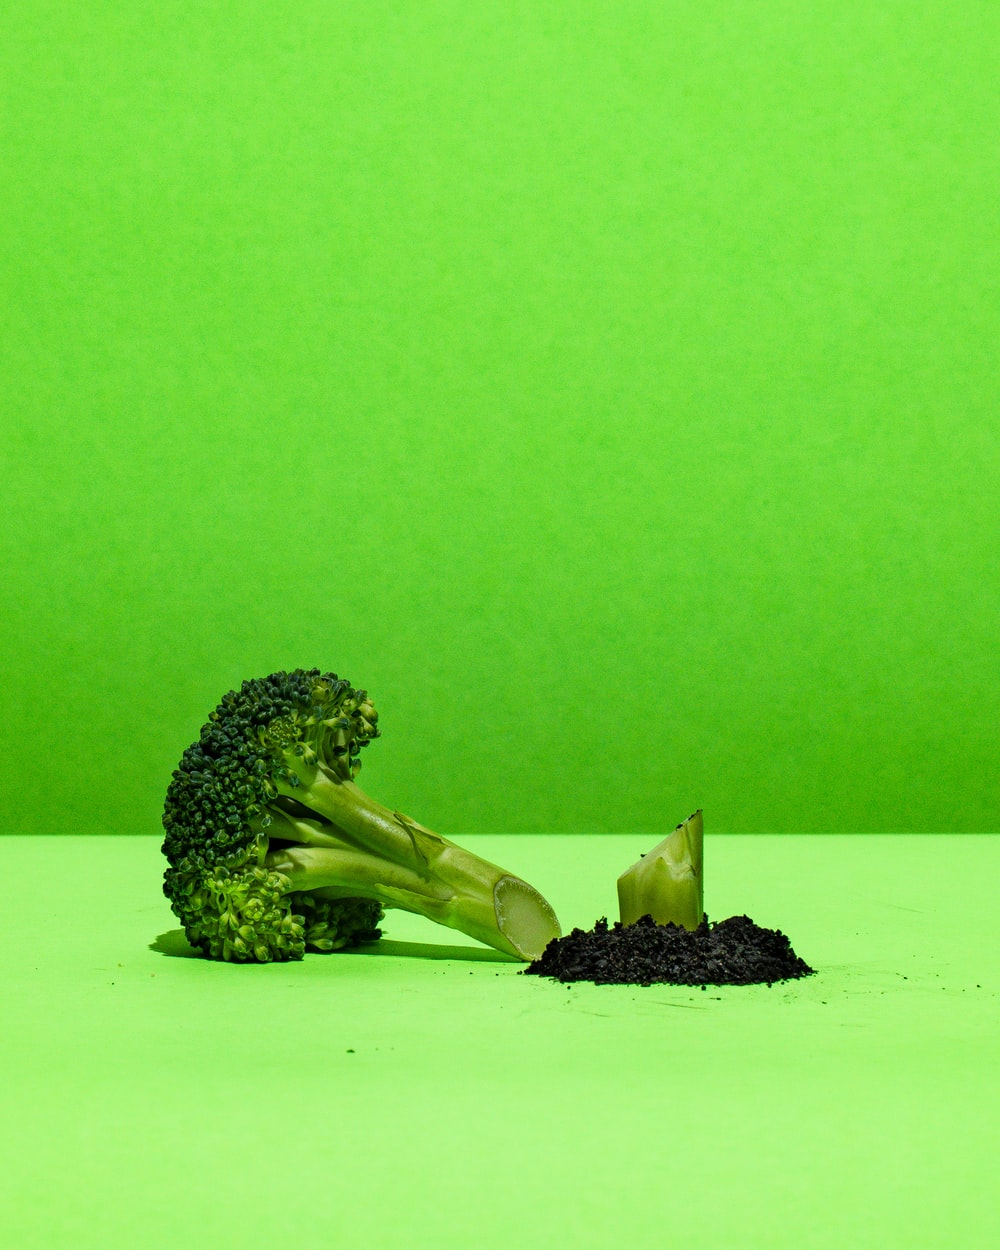 green broccoli on white paper